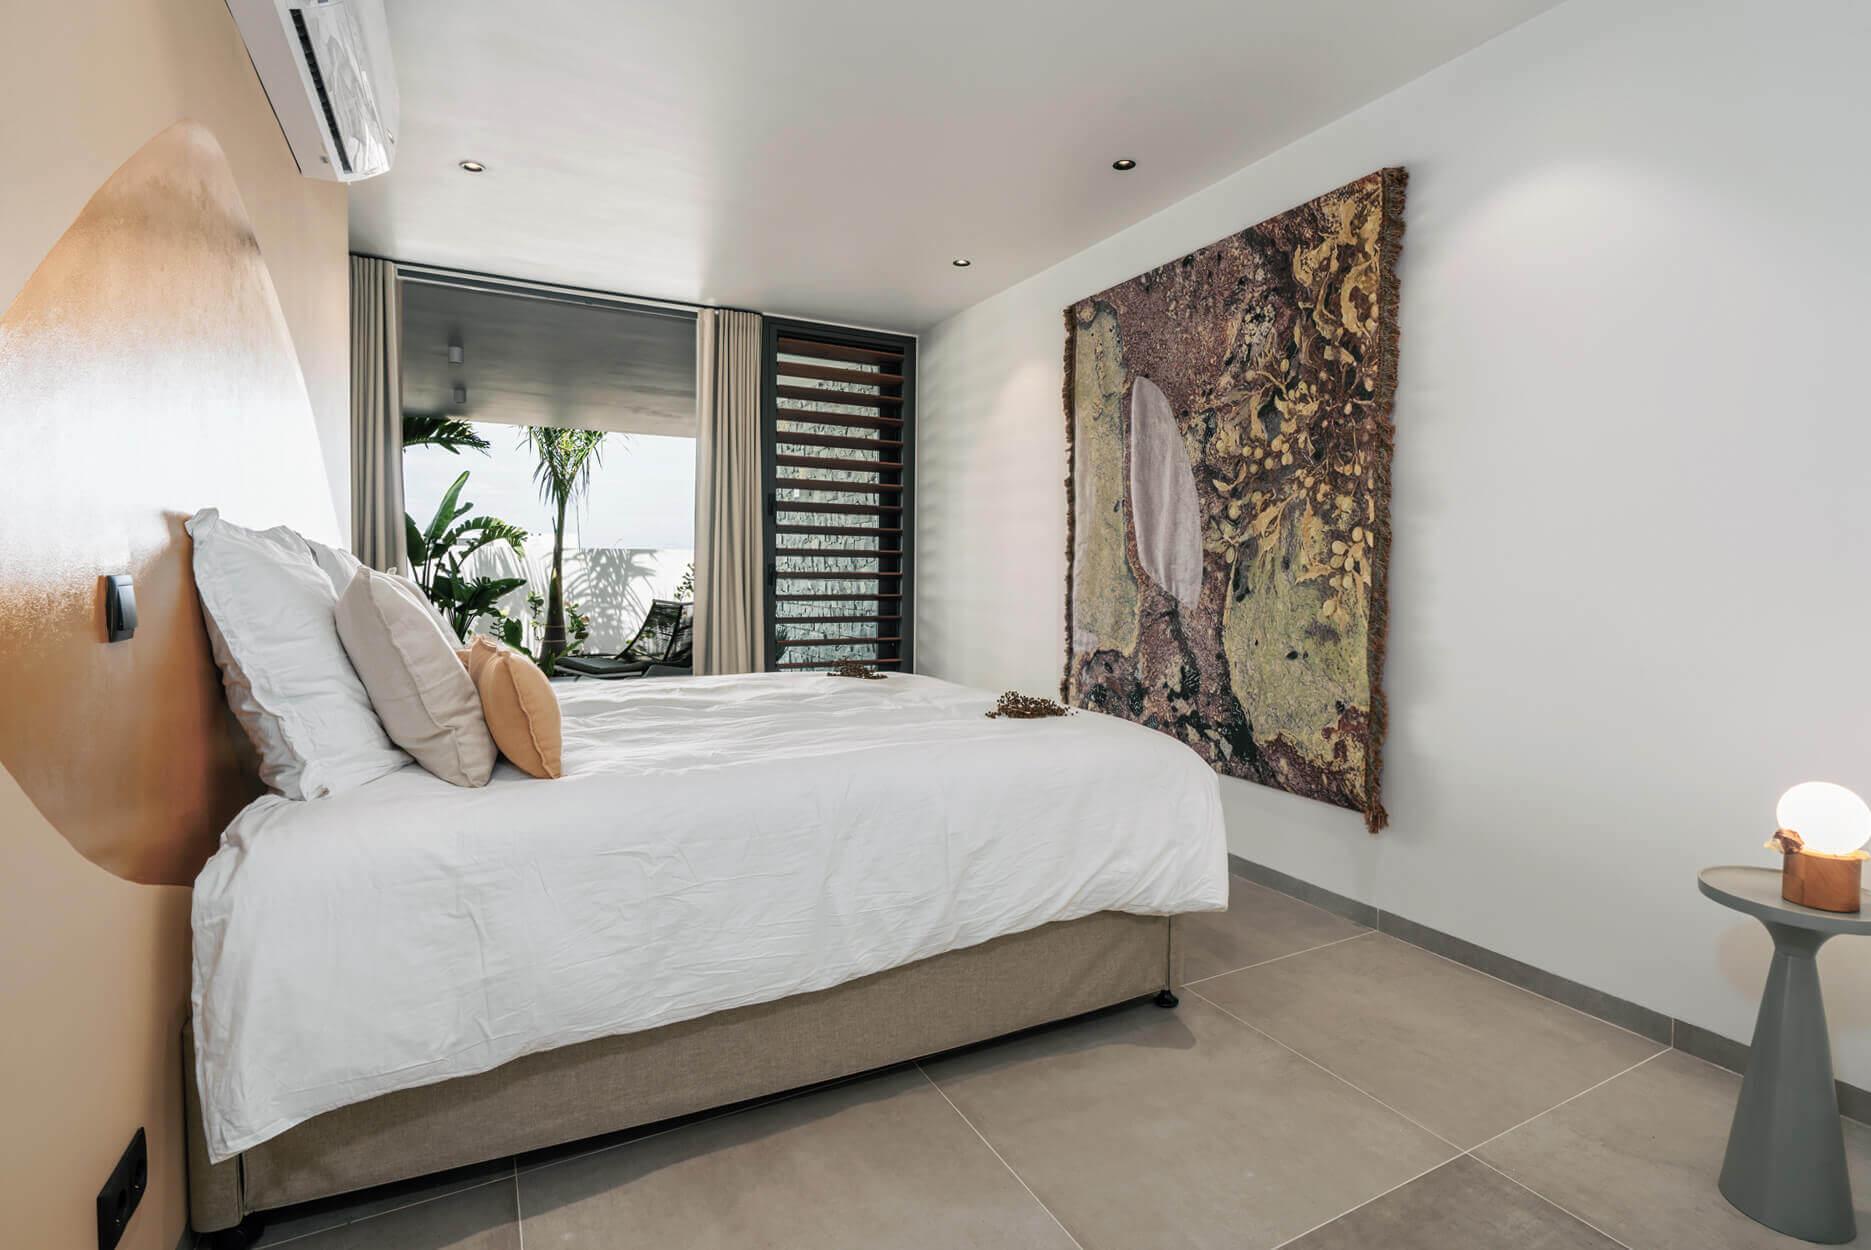 sea-roots-villas-villa-elise-slaapkamer1